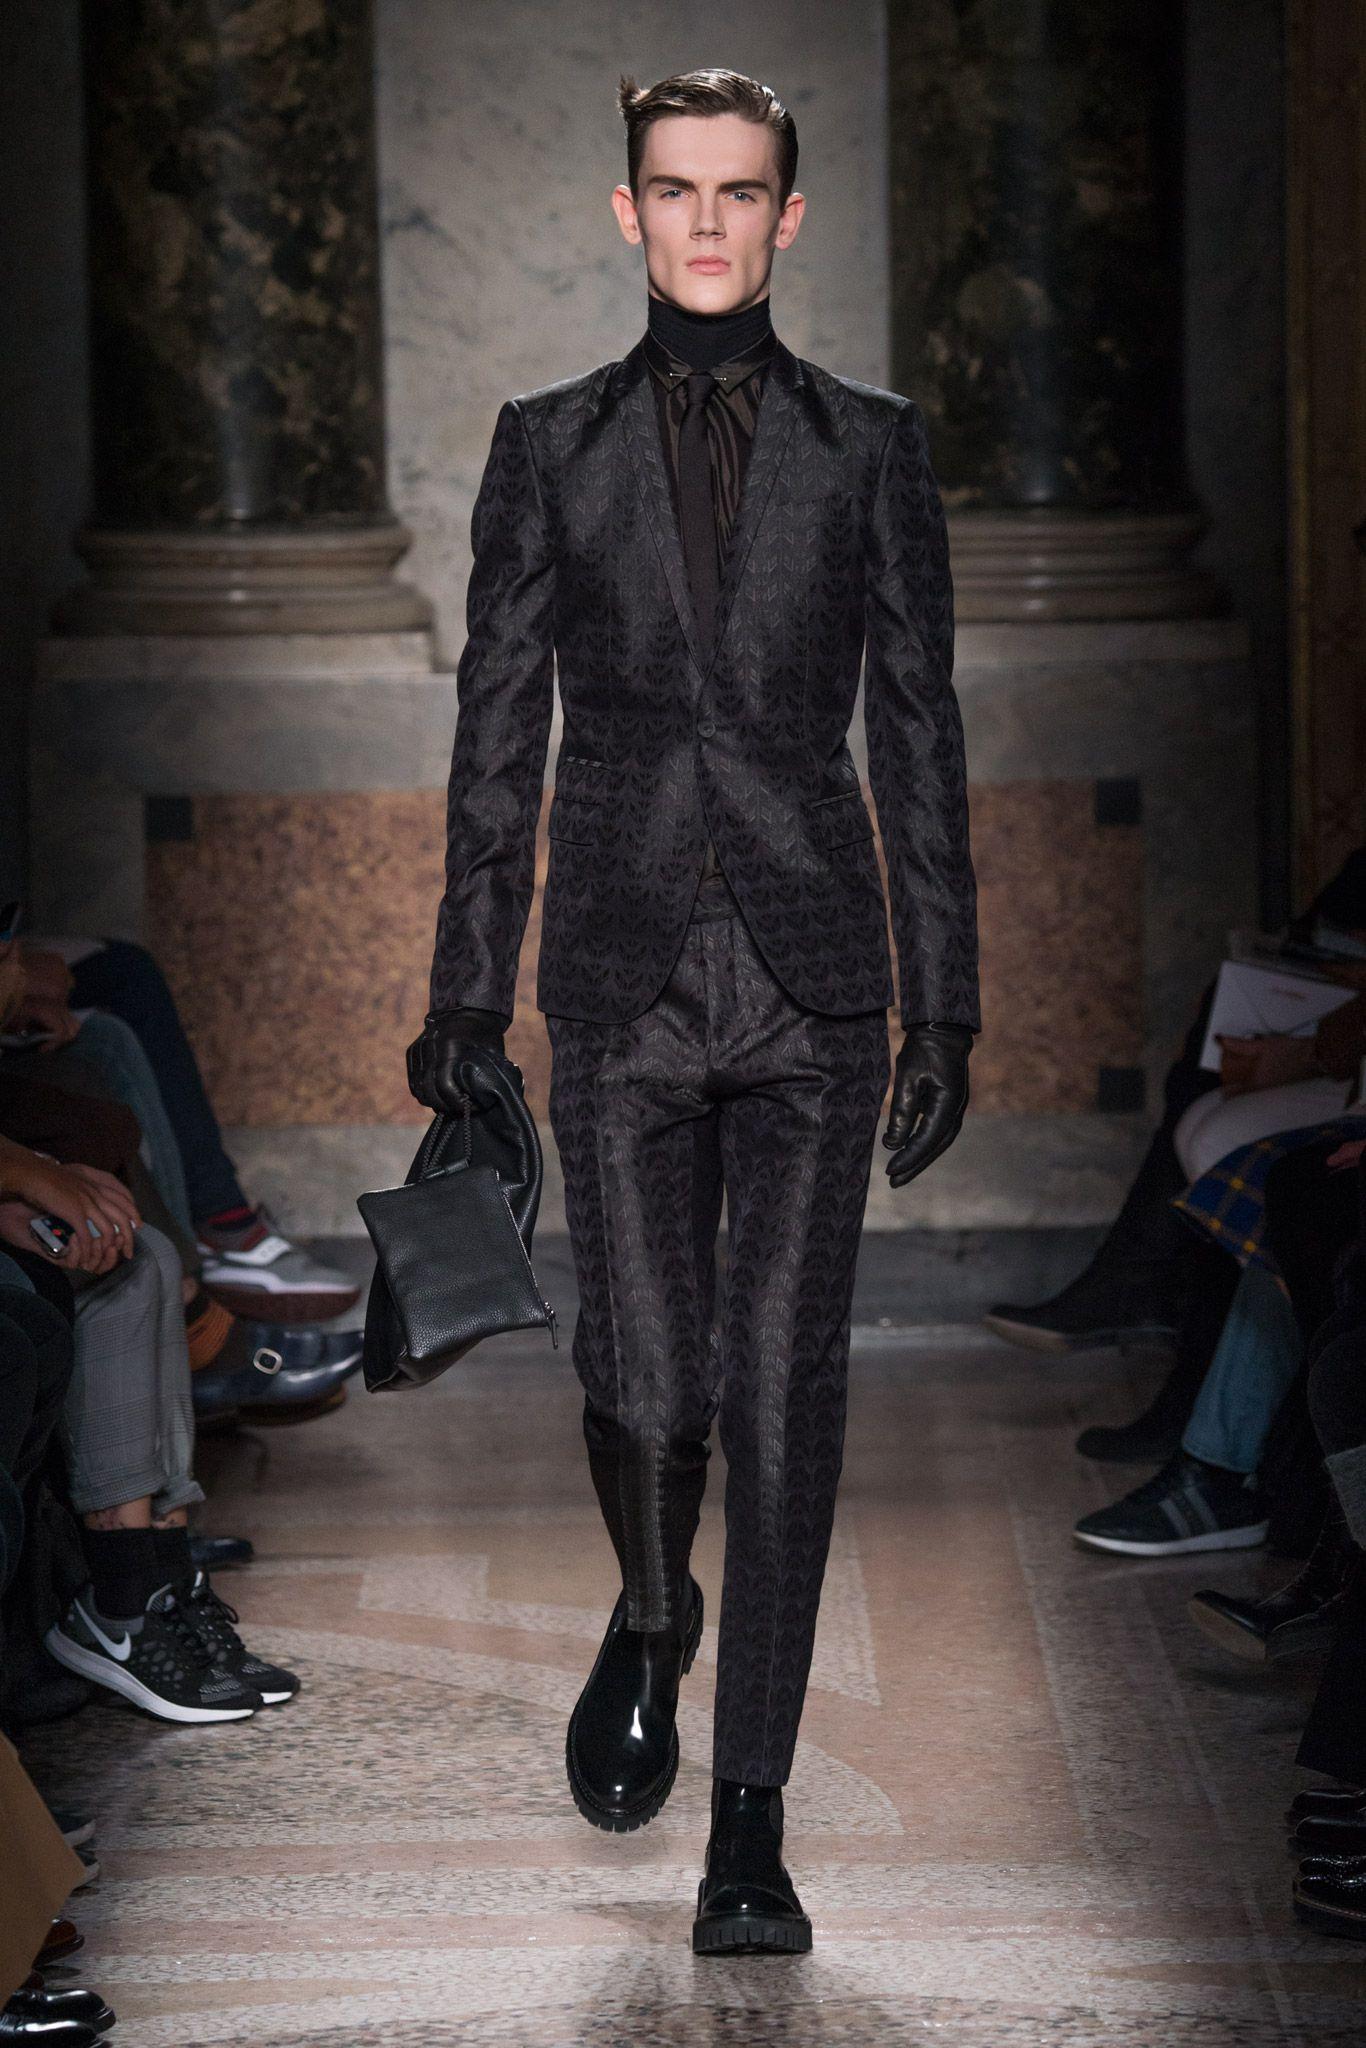 Les Hommes Fall 2015 Menswear   Fall 2015 Menswear   Menswear, Mens ... 5b9f477a2ffd